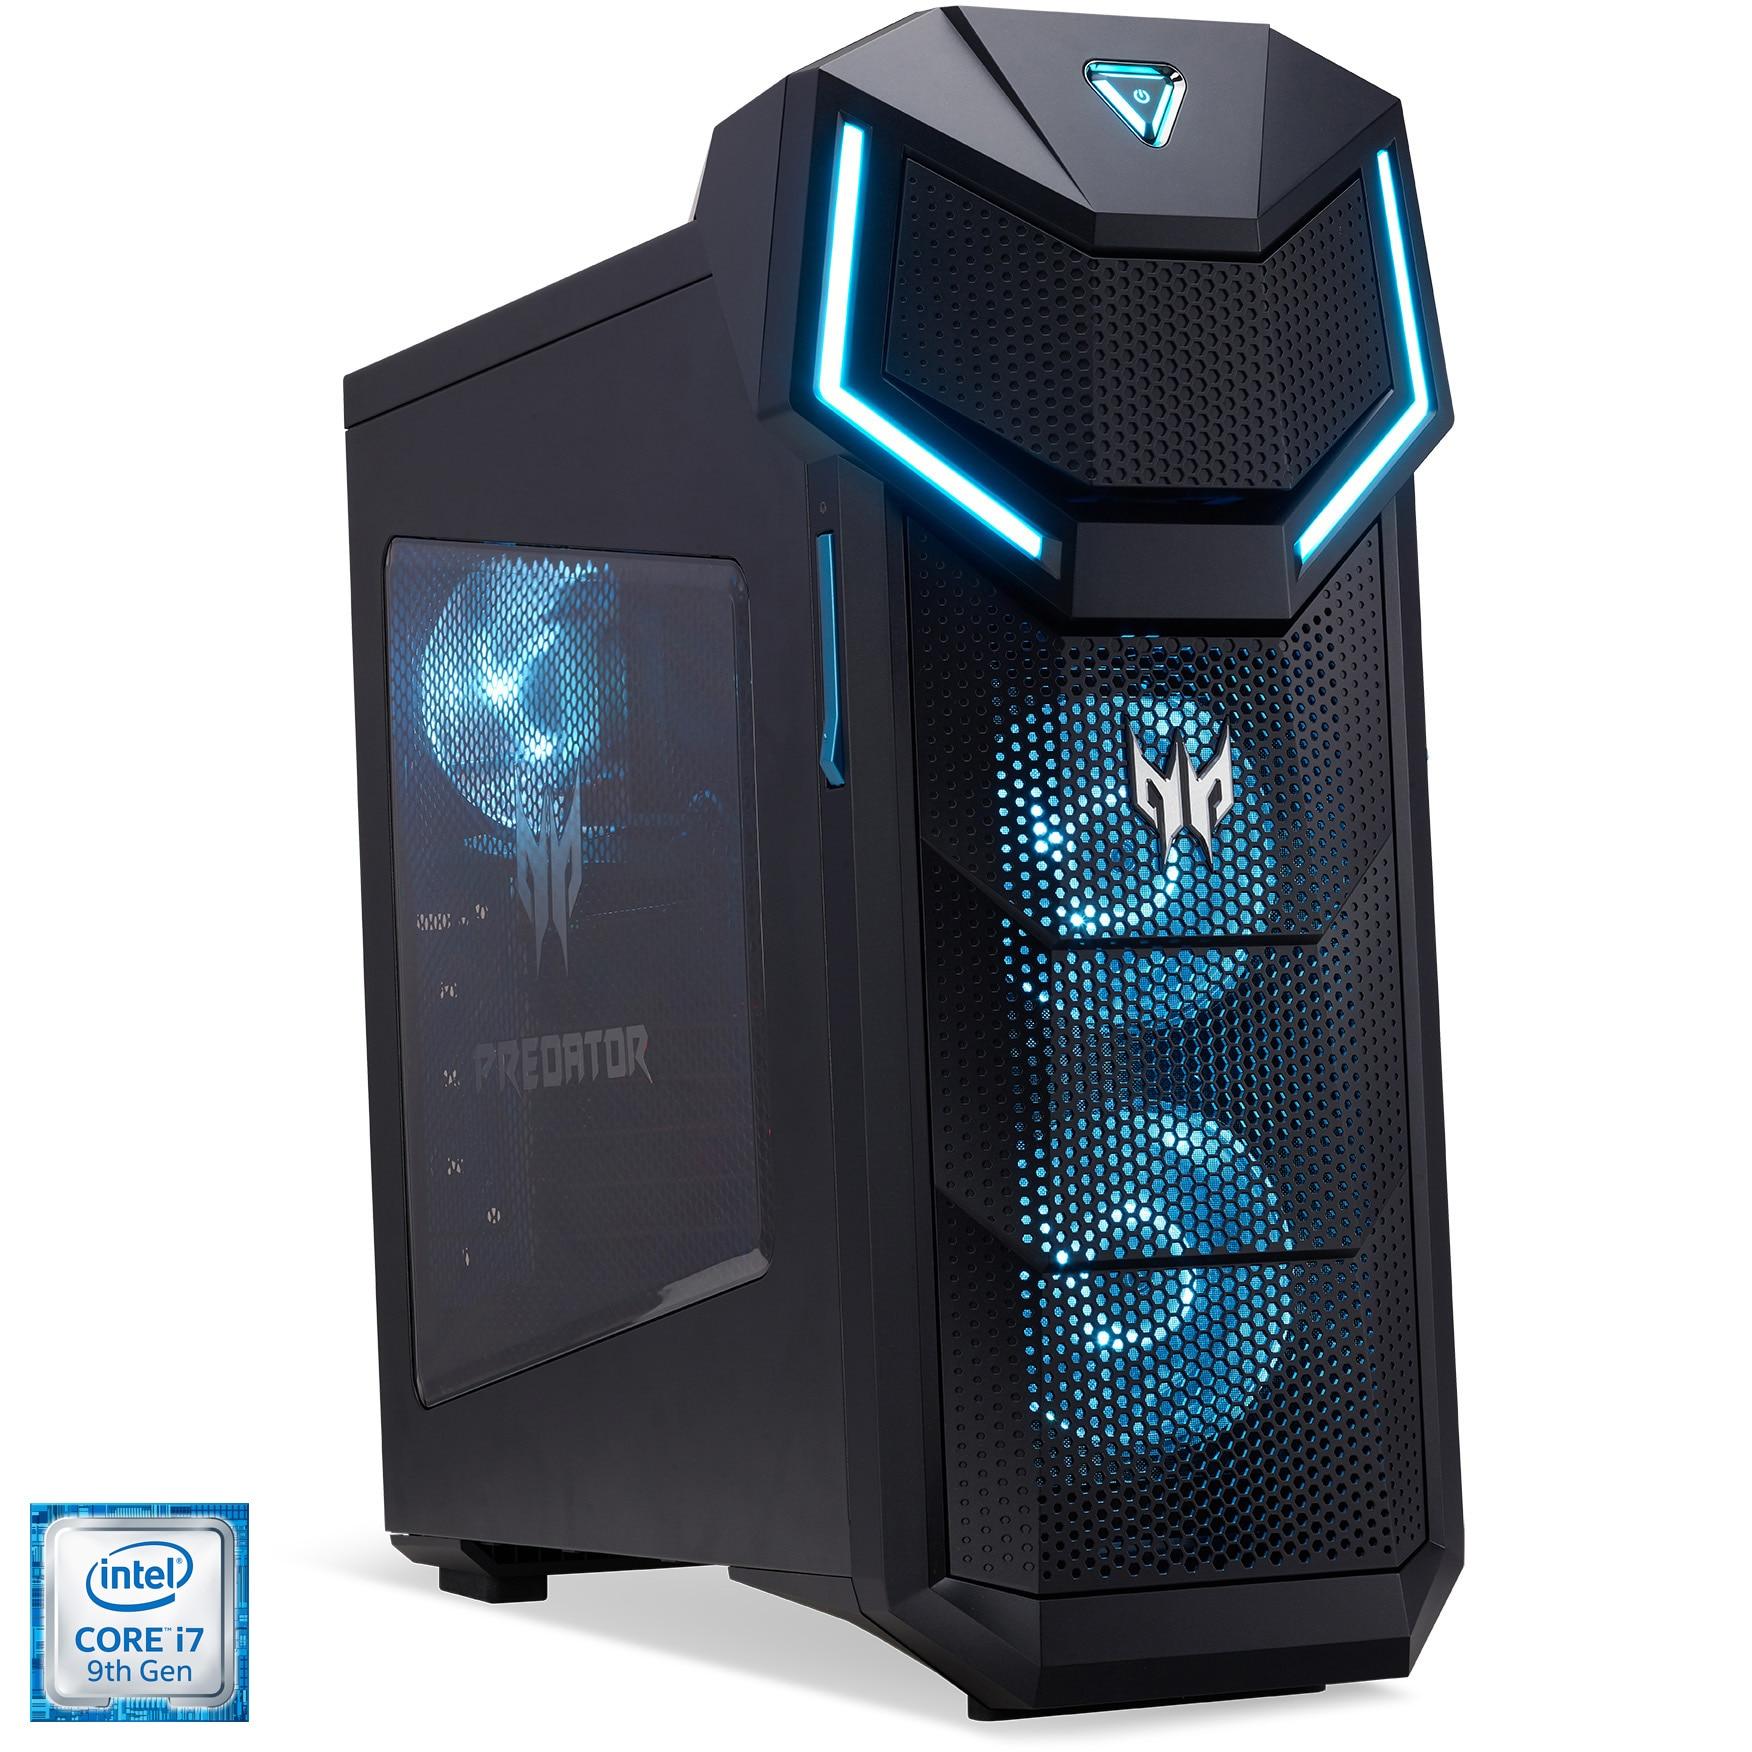 Fotografie Sistem Desktop PC Gaming Acer Predator Orion 5000 cu procesor Intel® Core™ i7-9700K pana la 4.90GHz, Coffee Lake, 16GB, 1TB HDD, 512GB SSD M.2 PCIe, GeForce® GTX 1660 Ti 6GB GDDR6, Microsoft Windows 10 Home, Black